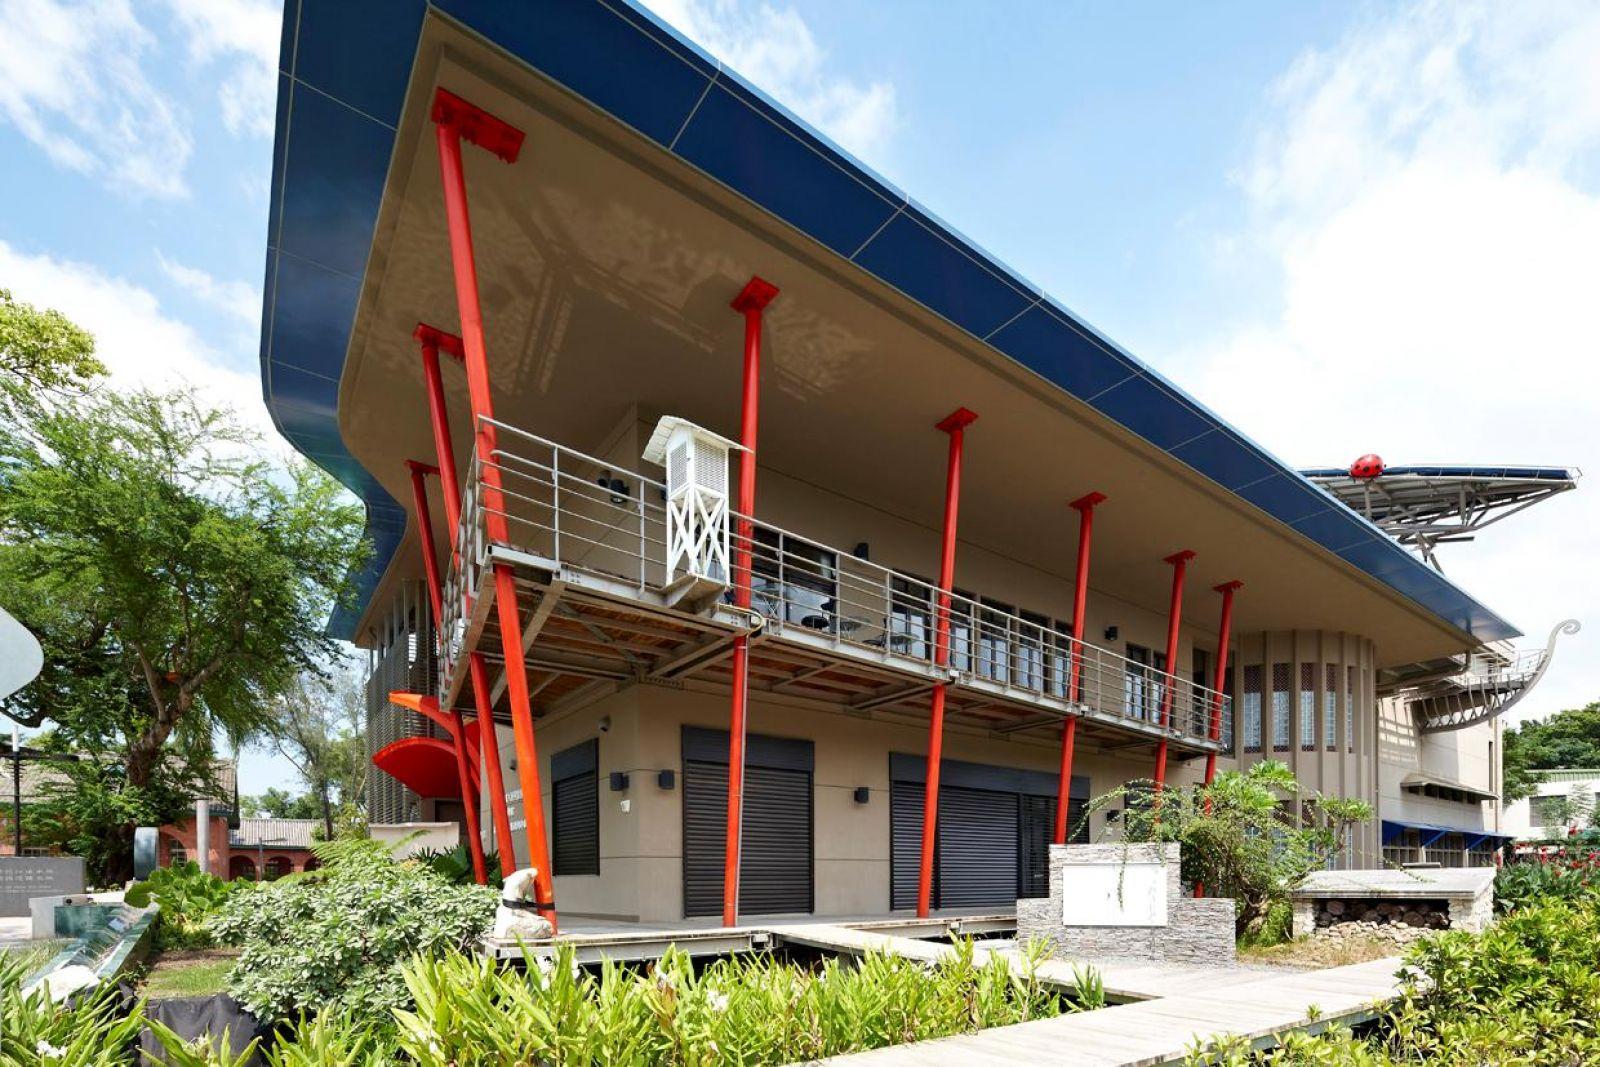 Magic school green building of national chung kung university